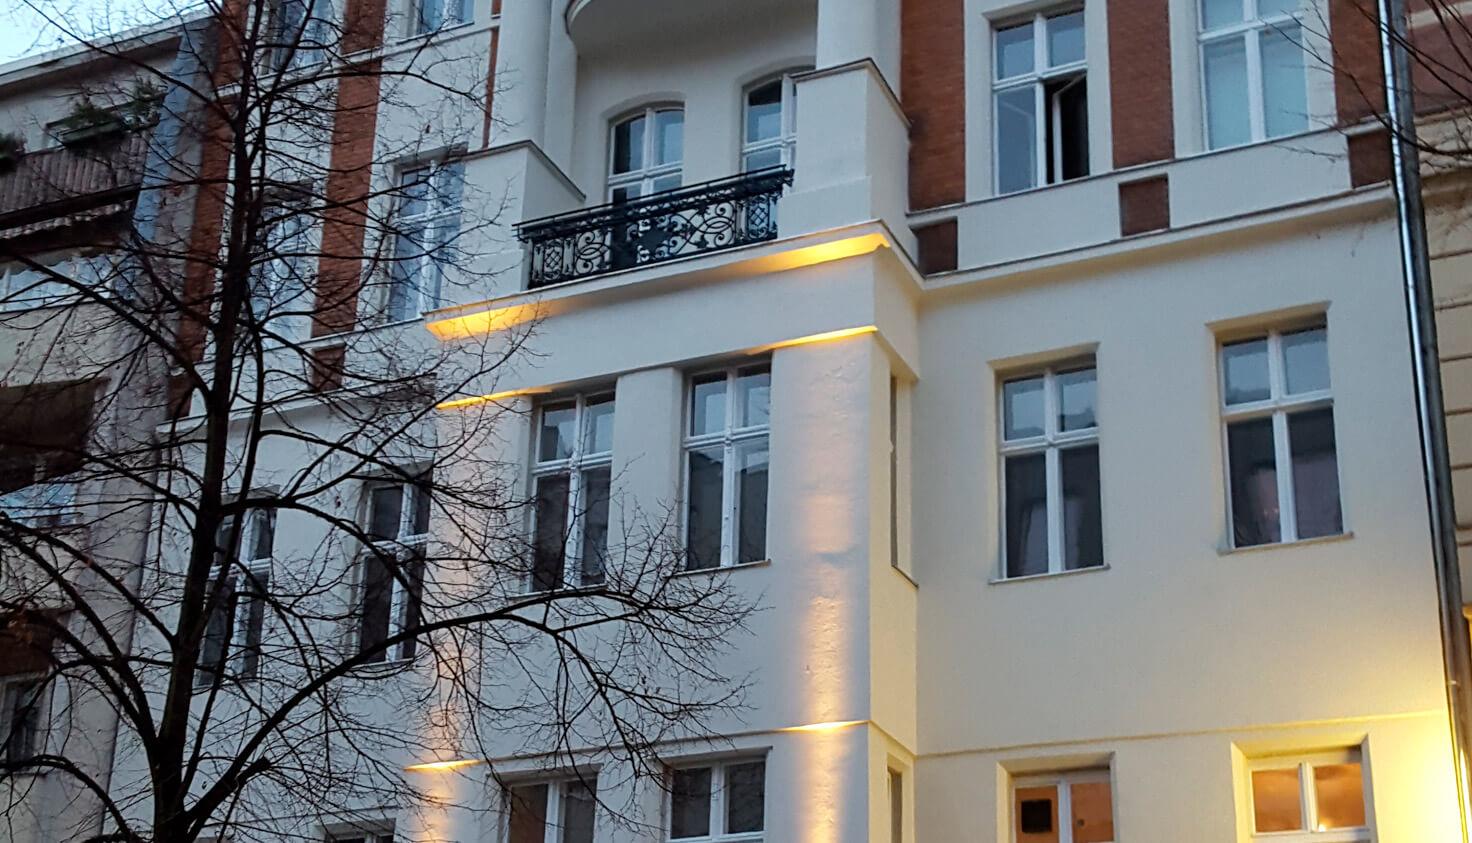 Ansbacher Straße Berlin - Referenz Malerbetrieb Kluge